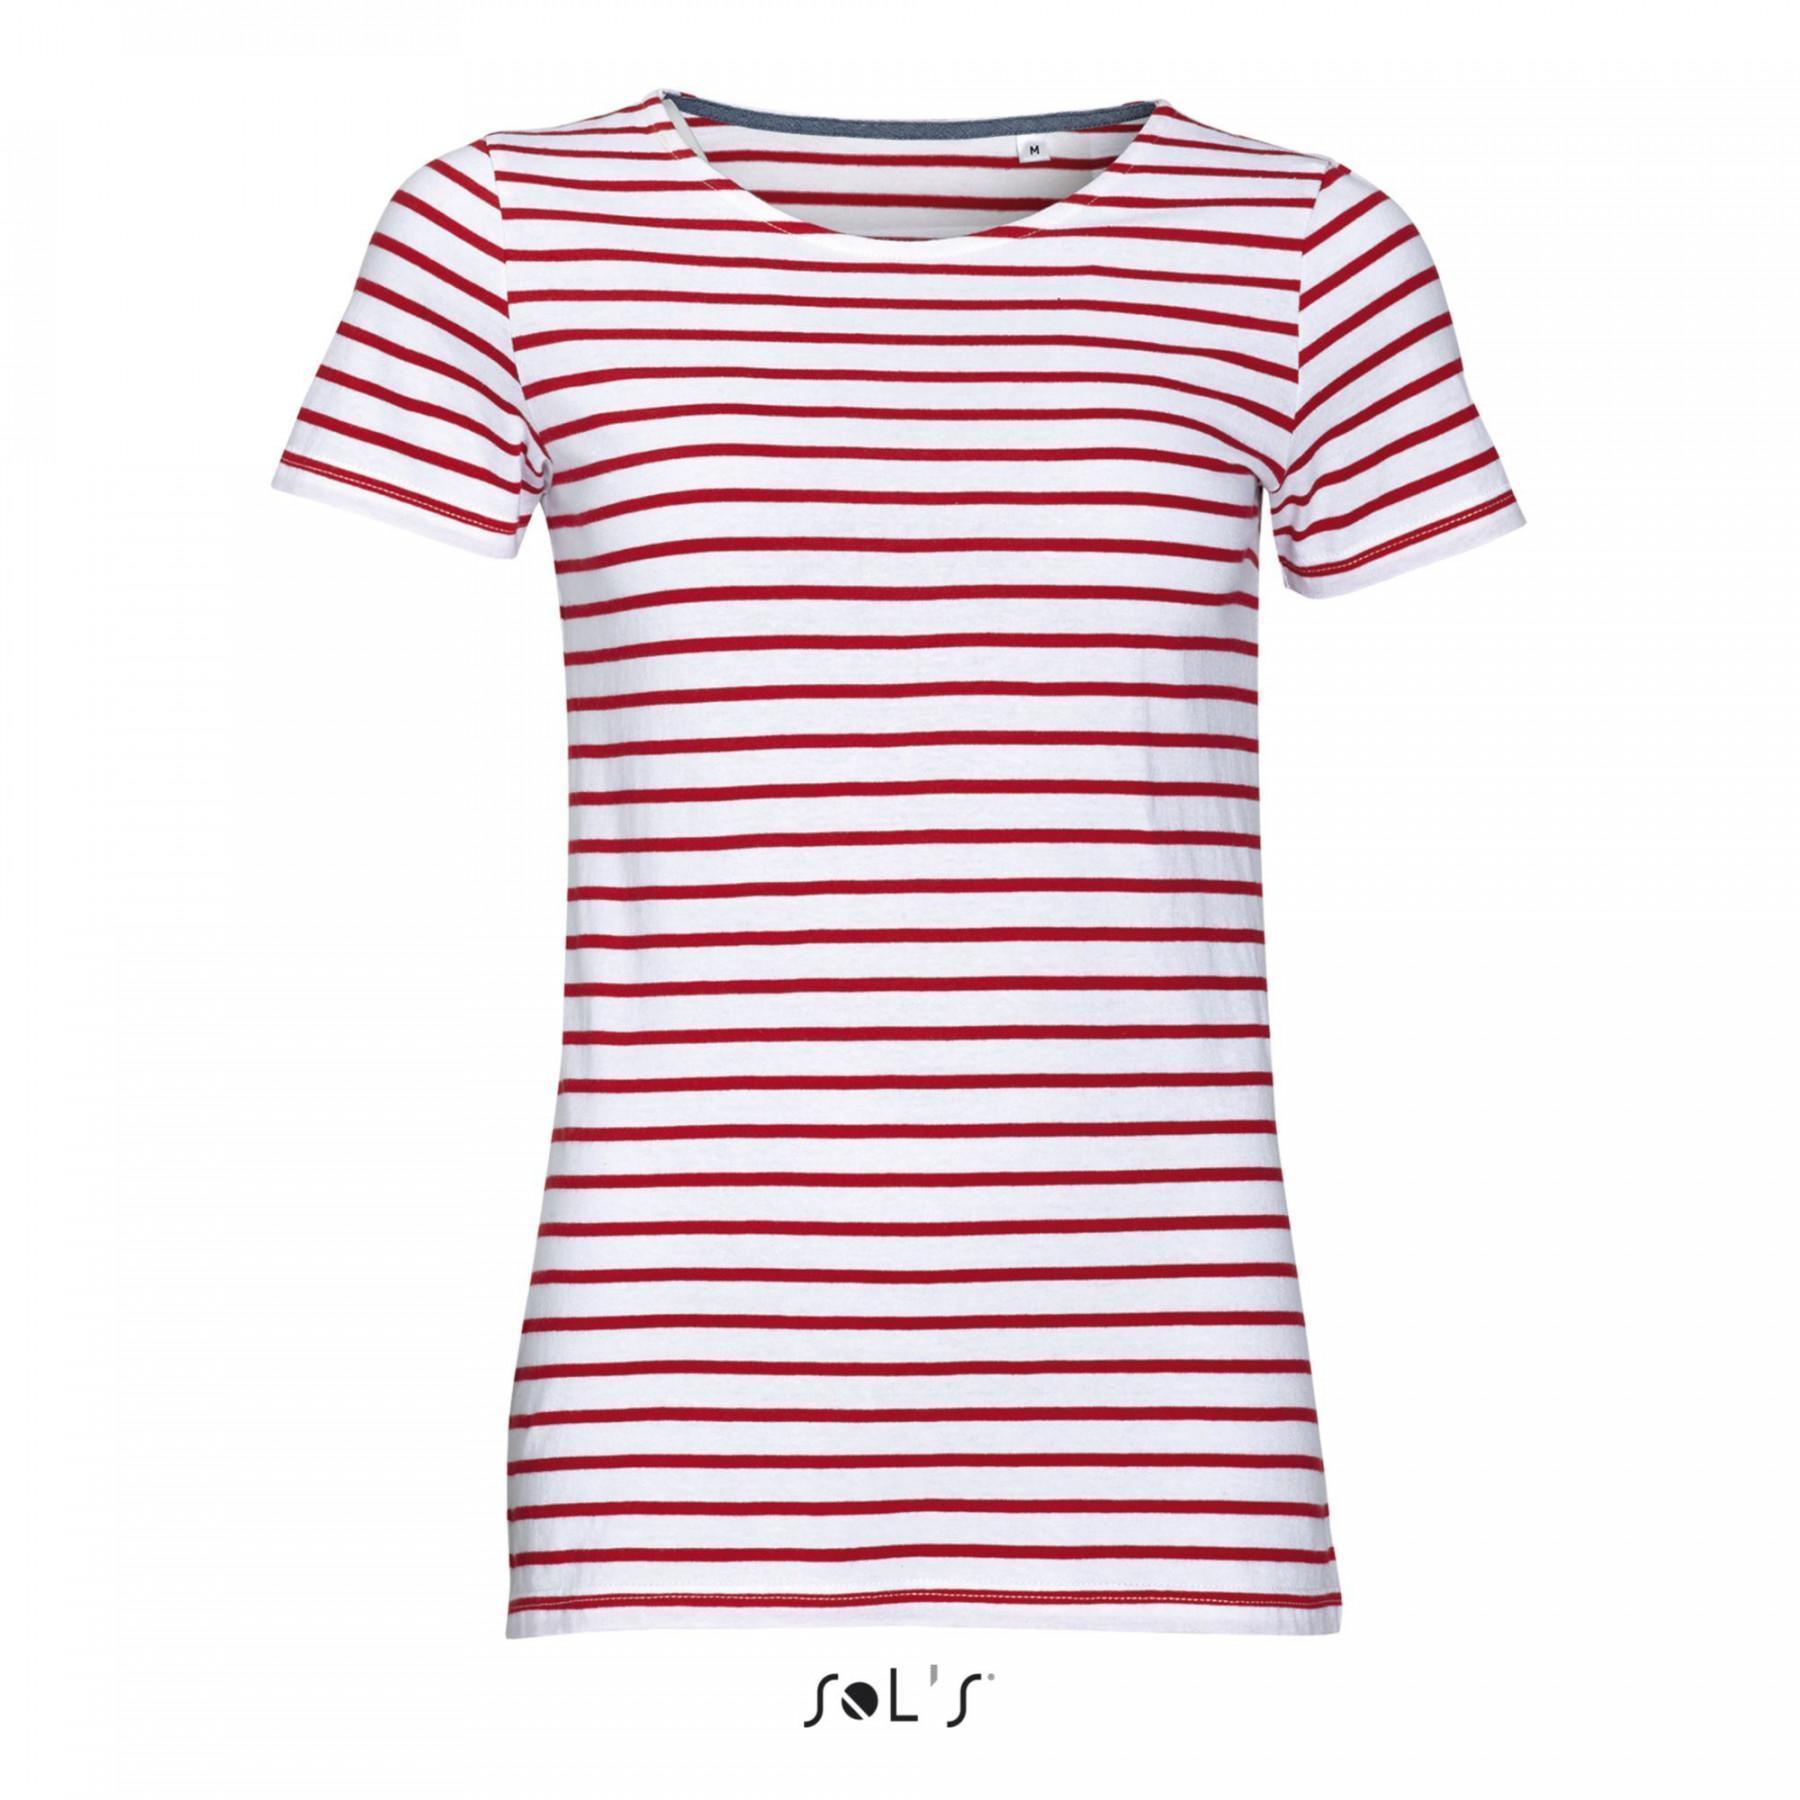 Sol's Miles women's T-shirt